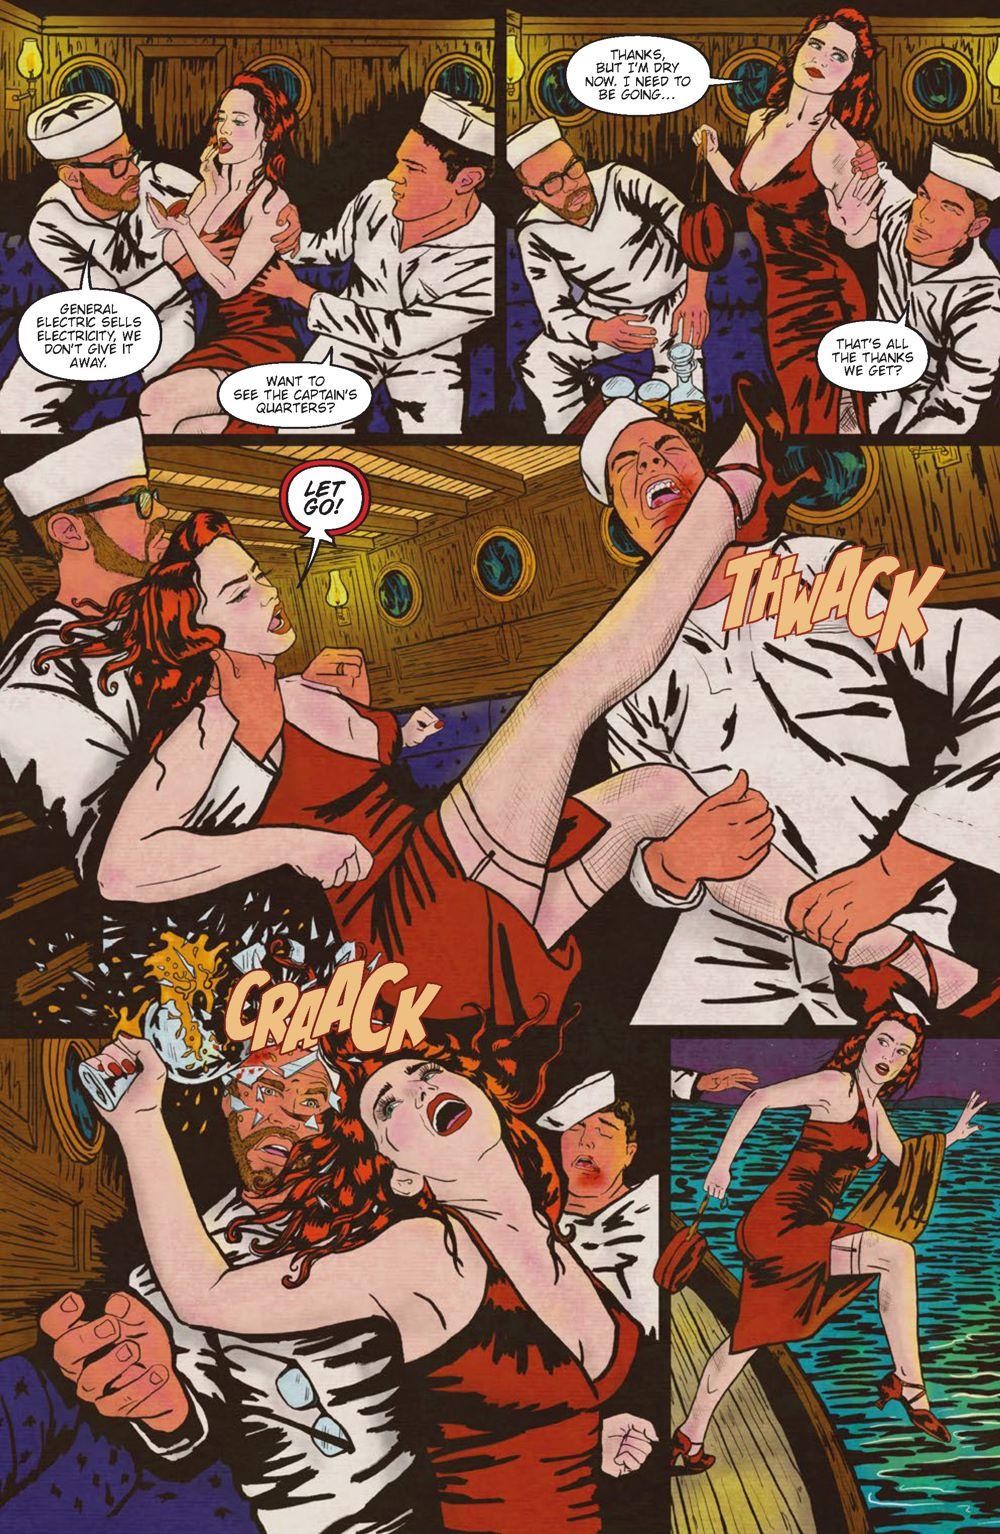 Minky-Interiors-Page_4 ComicList Previews: MINKY WOODCOCK THE GIRL WHO ELECTRIFIED TESLA #1